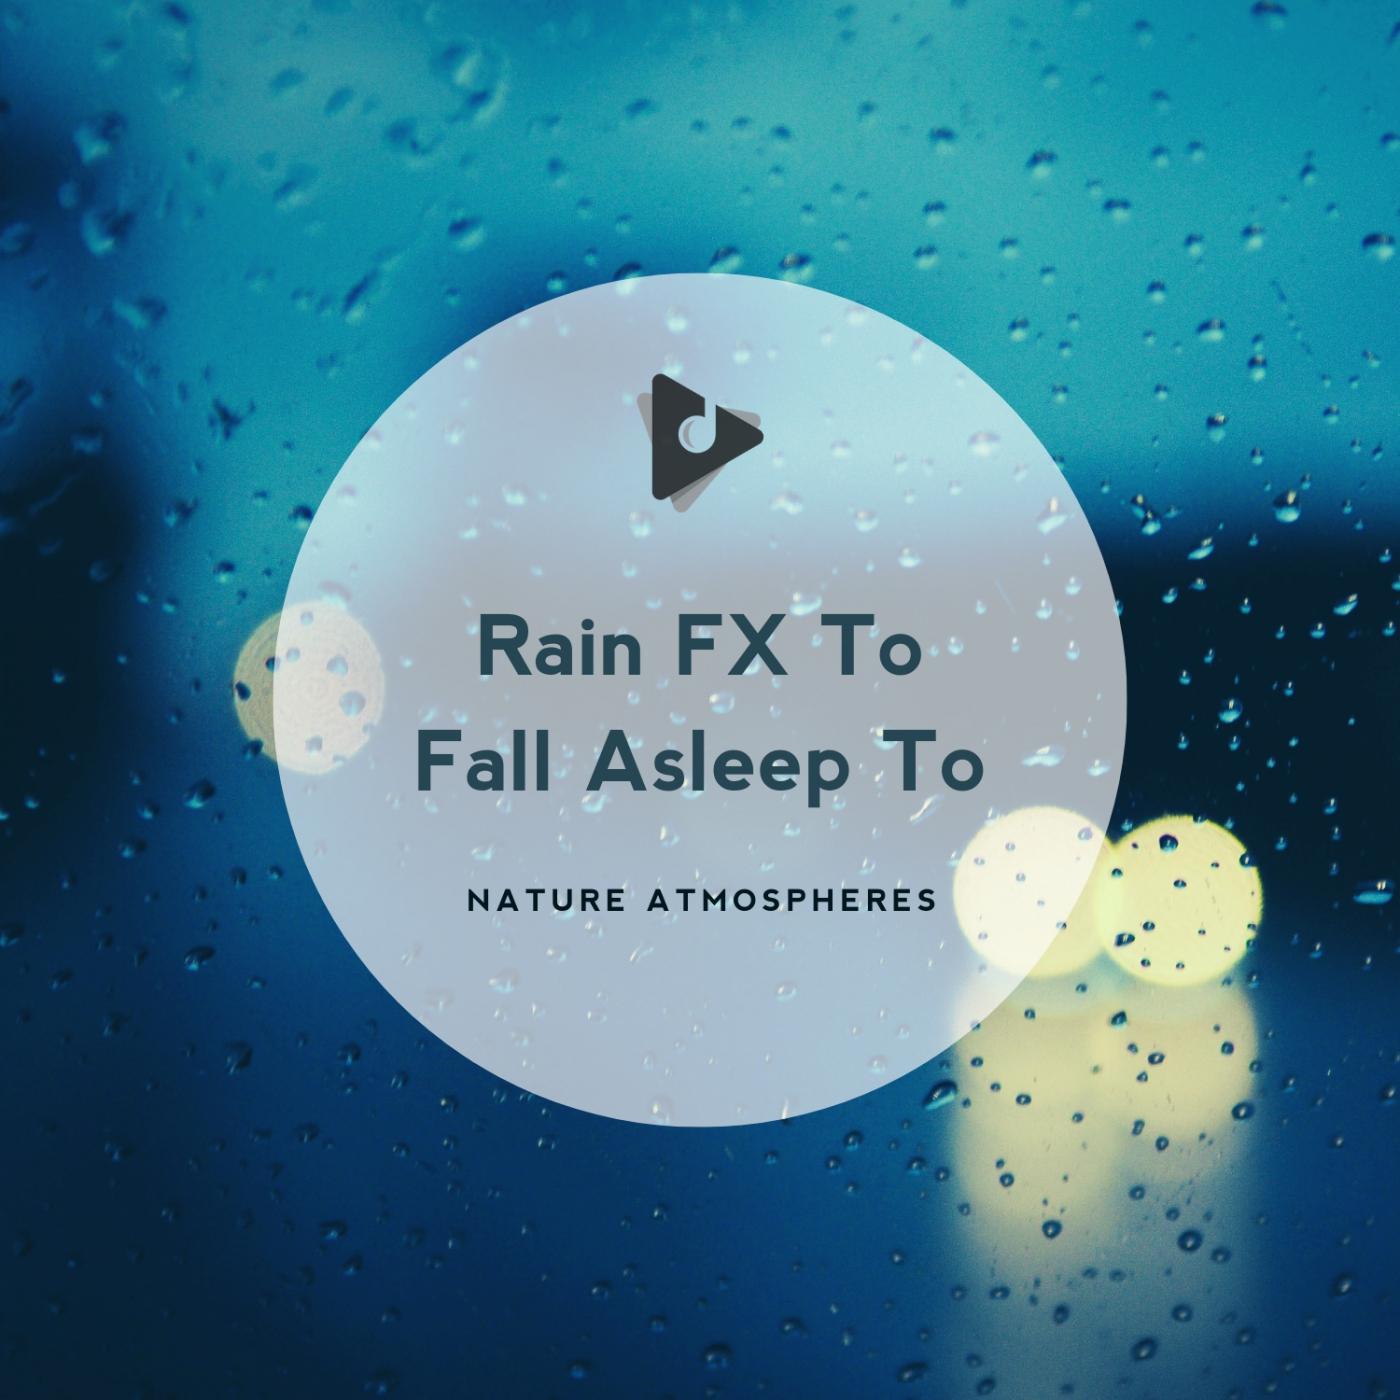 Rain FX To Fall Asleep To